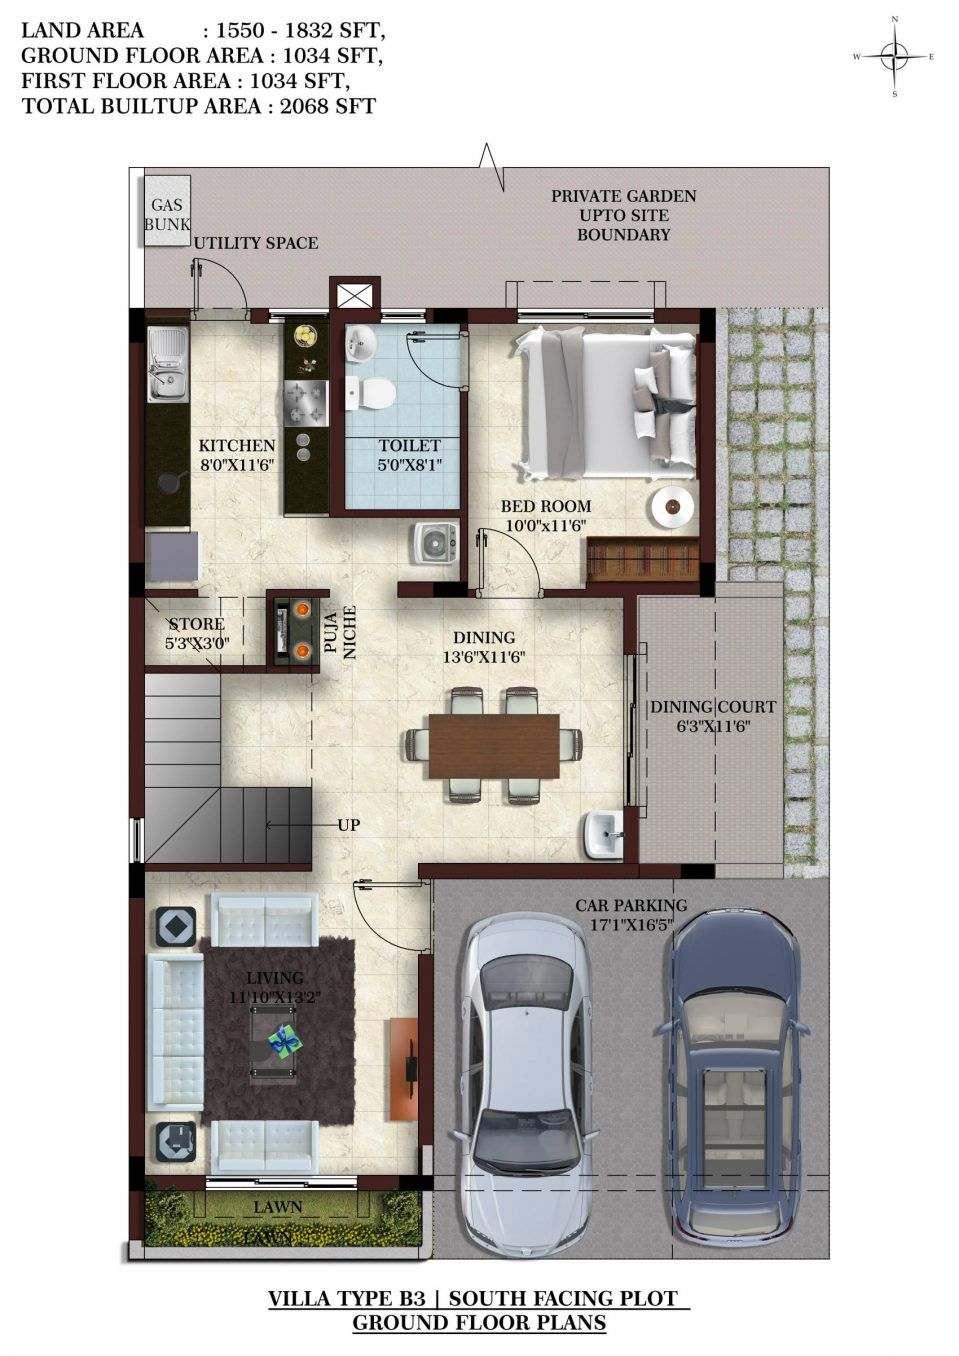 Duplex House Plans 500 Sq Ft 20x30 House Plans Indian House Plans 2bhk House Plan